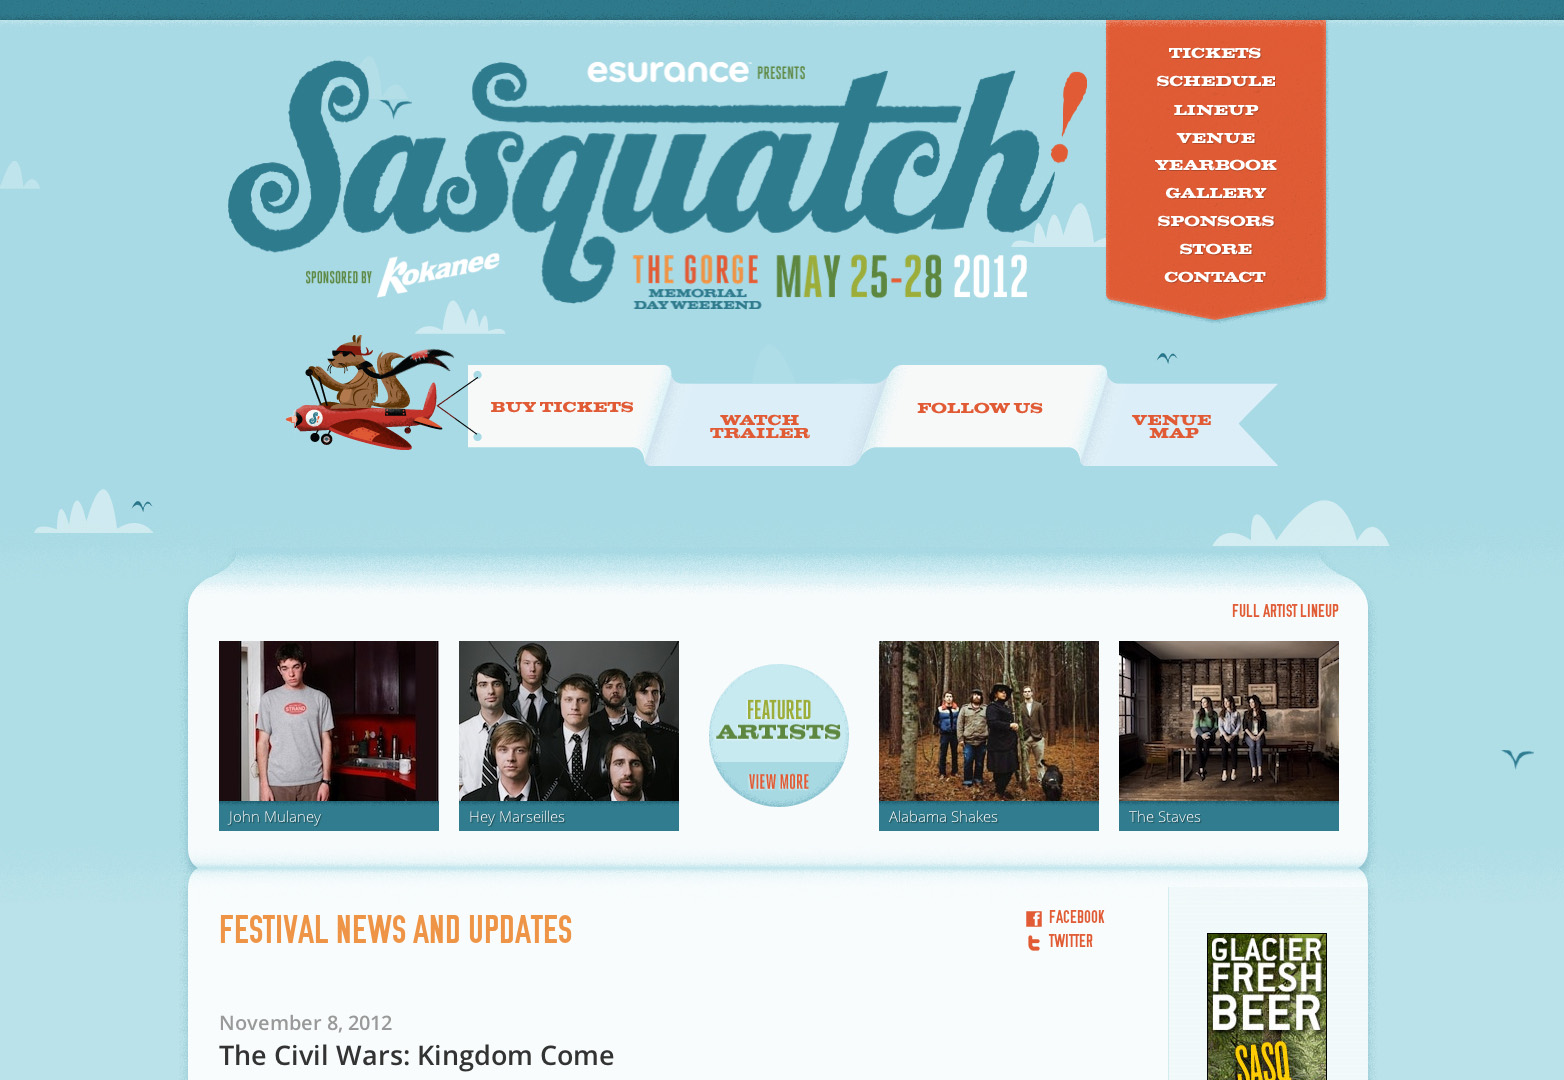 20 creative and inspiring event websites | Webdesigner Depot